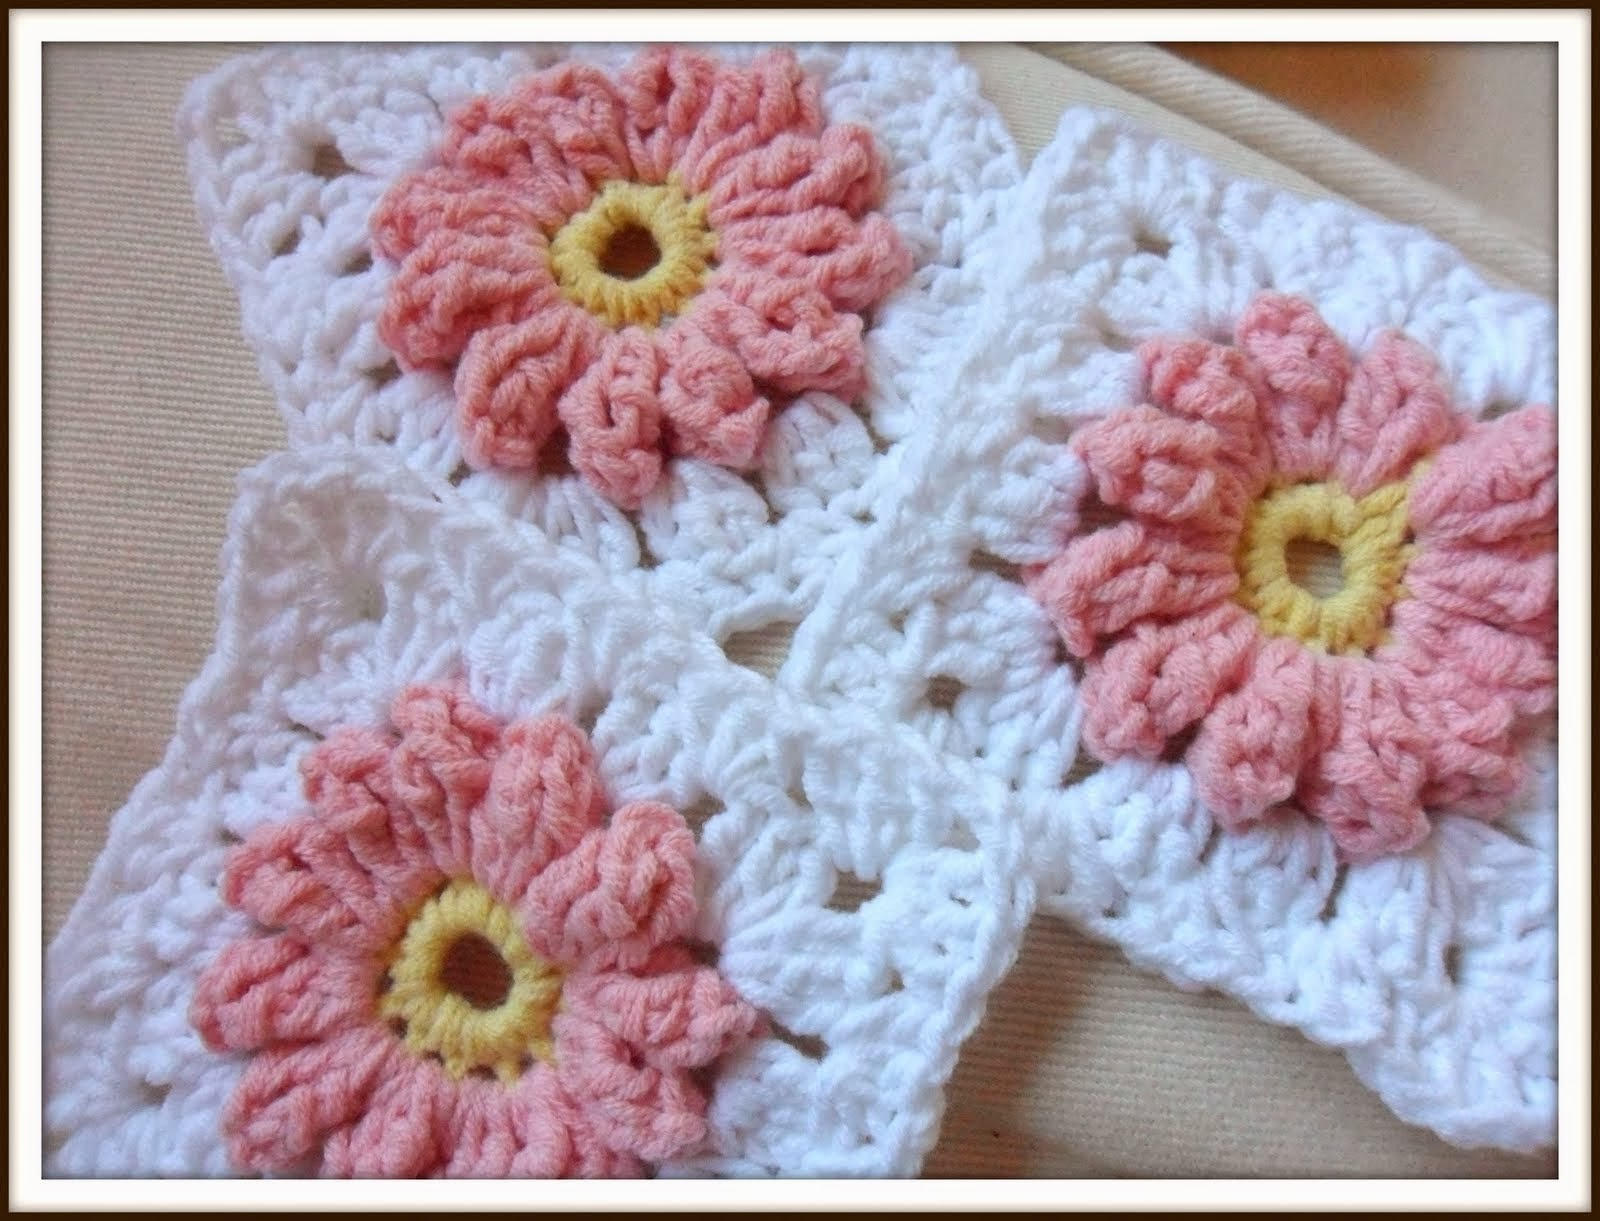 Gillyflower Pink Popcorn Flowers